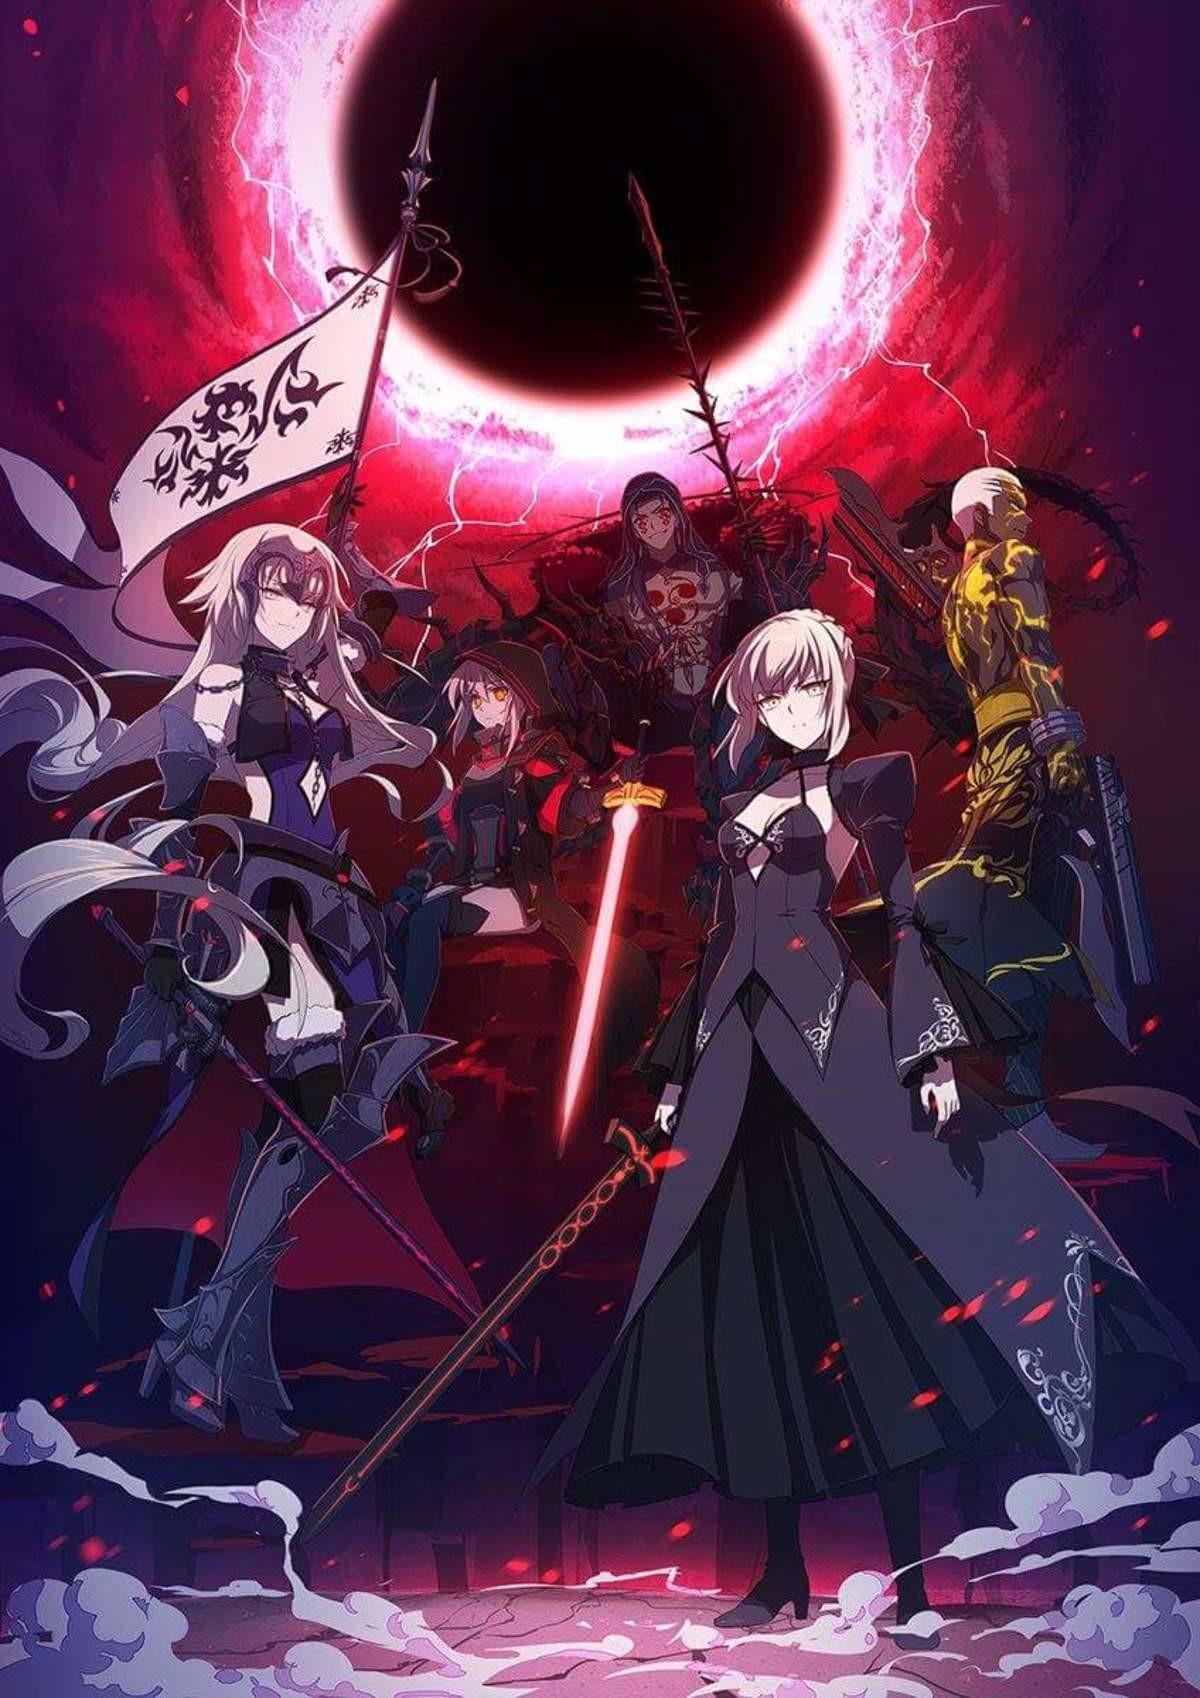 Listens To Linkin Park Once. . Anime manga fatego alter jalter salter Edgy